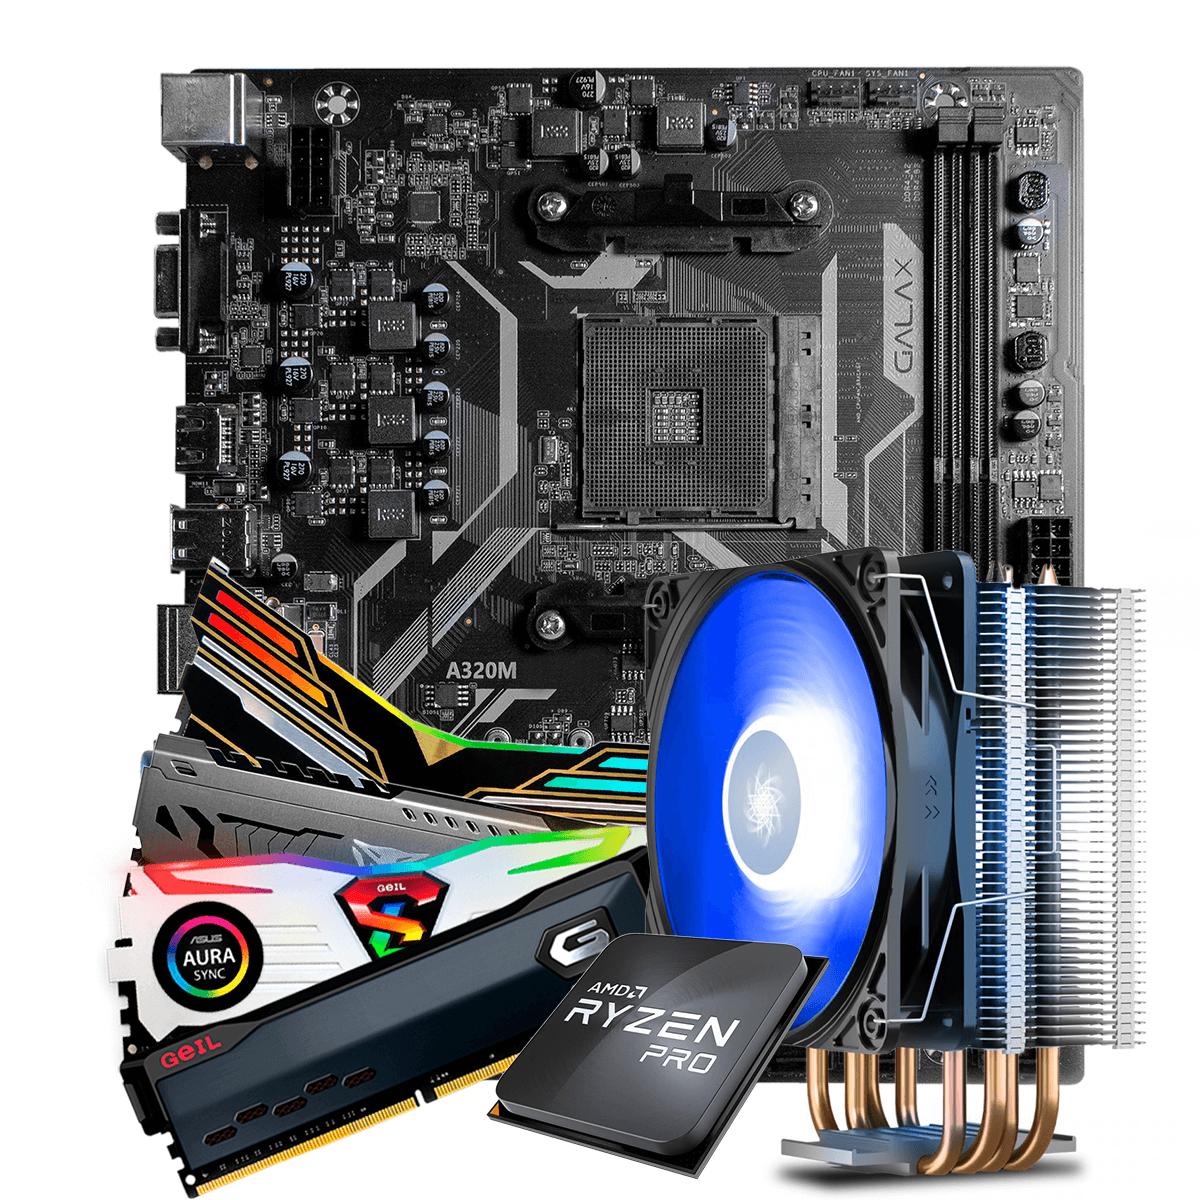 Kit Upgrade, AMD Ryzen 3 PRO 3200GE 3.8GHz Turbo + Cooler, + Galax A320M + Memória DDR4 8GB 3000MHz